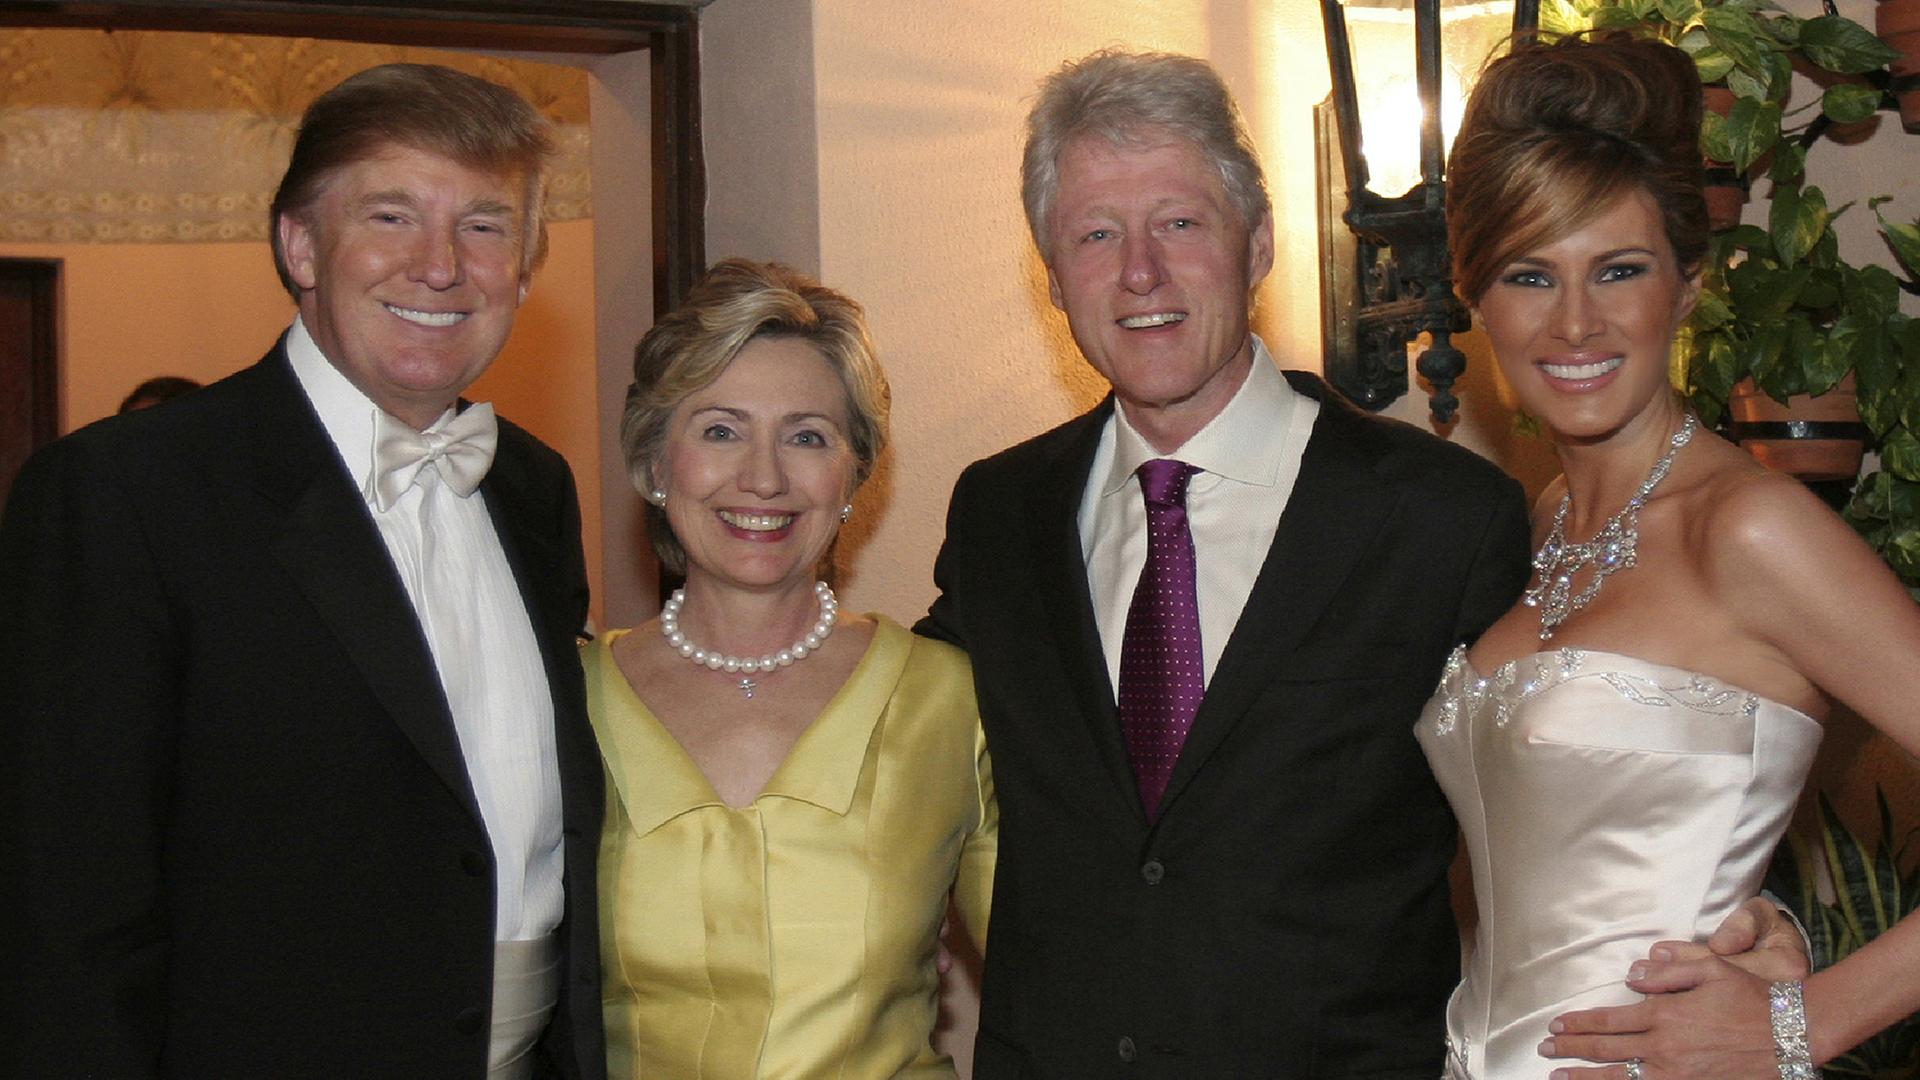 celebrity hillary clinton bill donald trumps wedding photo